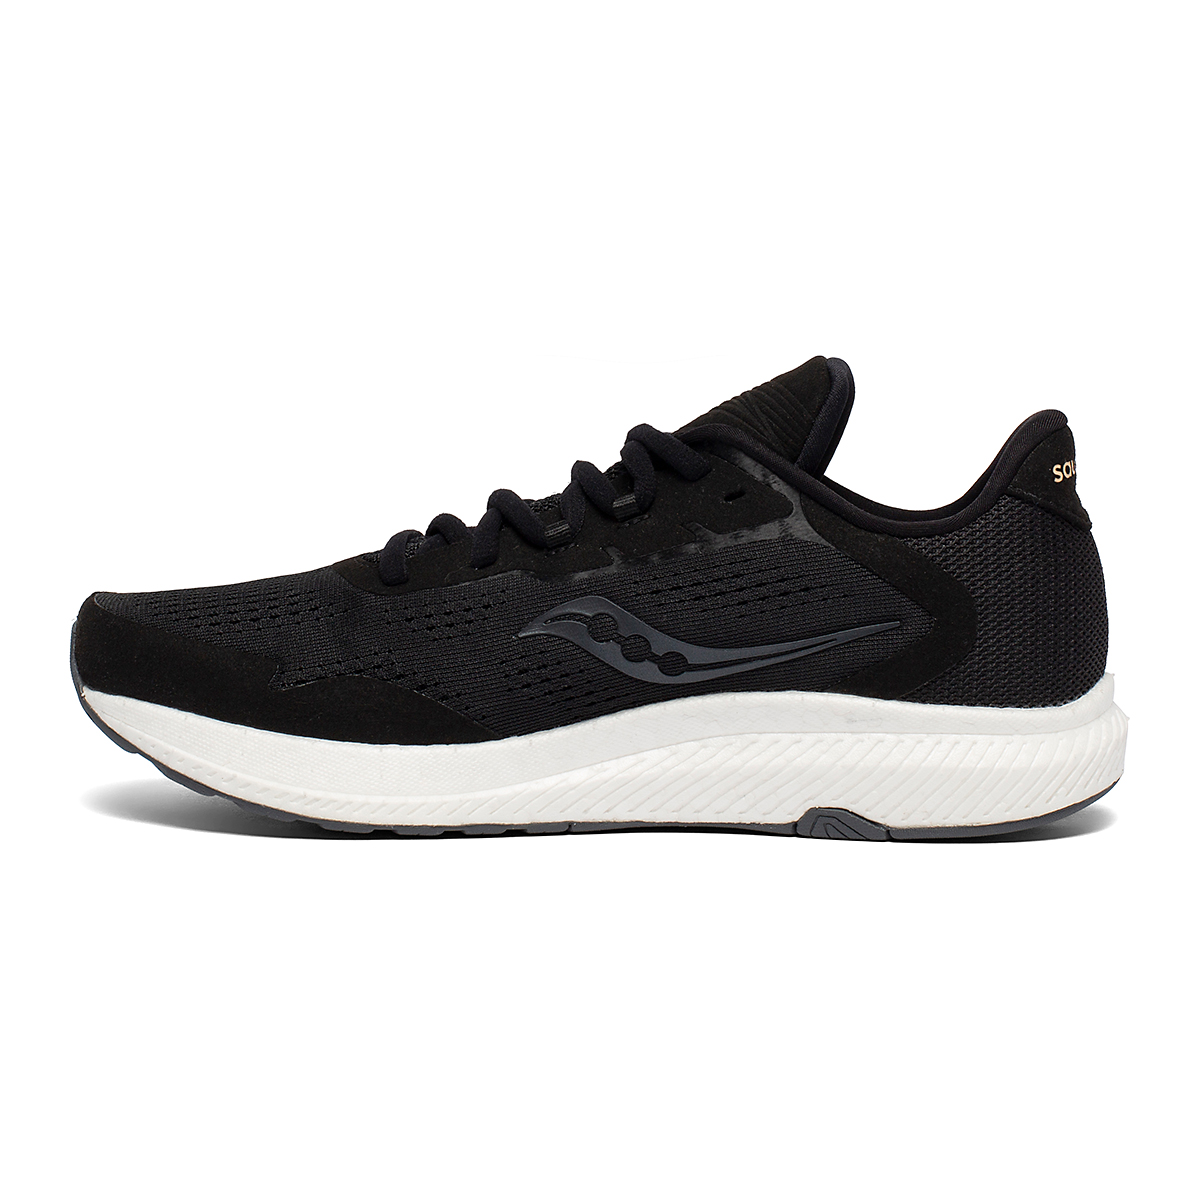 Women's Saucony Freedom 4 Running Shoe - Color: Black/Sunset - Size: 5 - Width: Regular, Black/Sunset, large, image 2